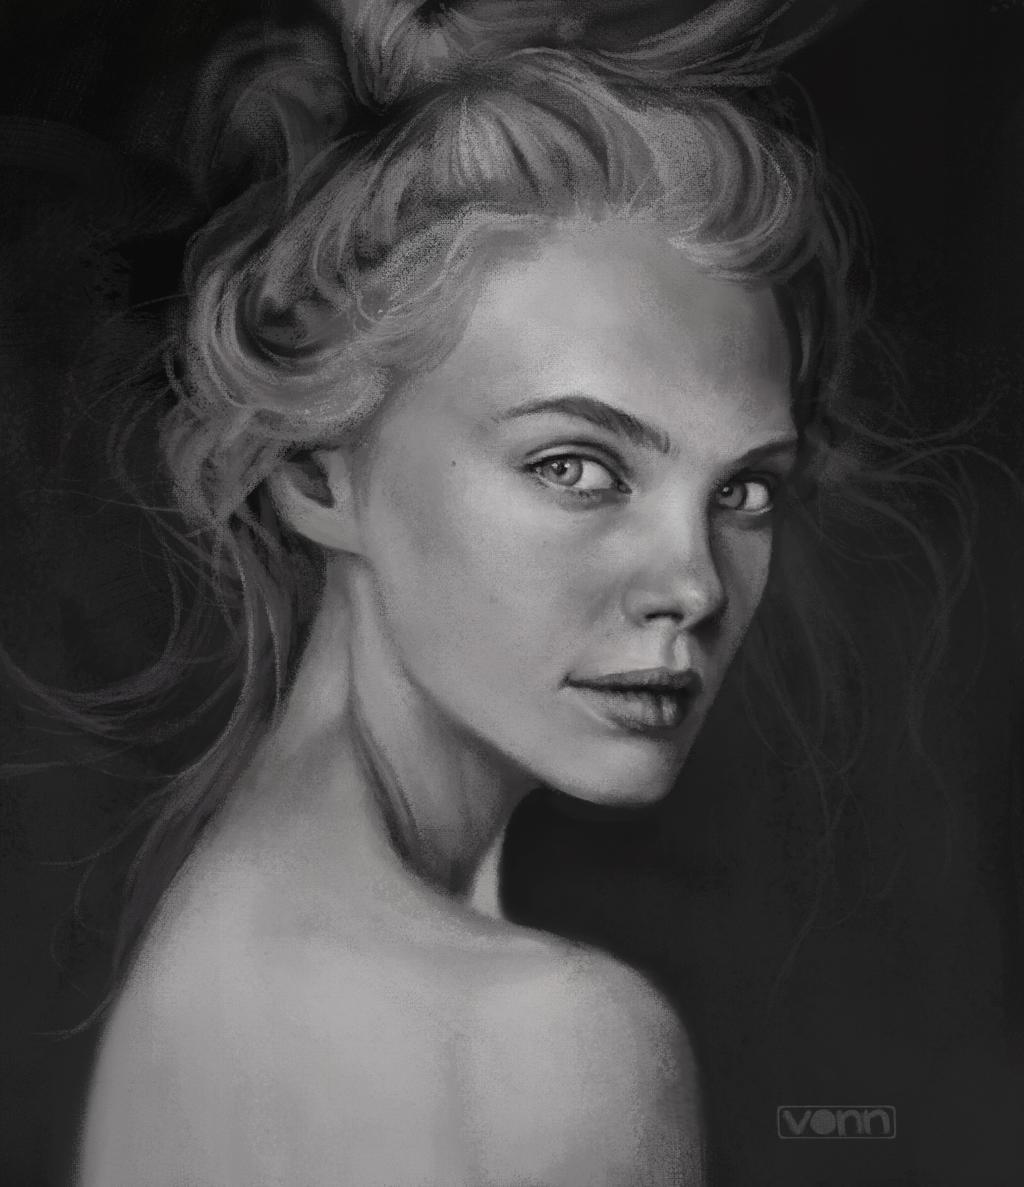 Female Profile Sketch 122514 By Tvonn9